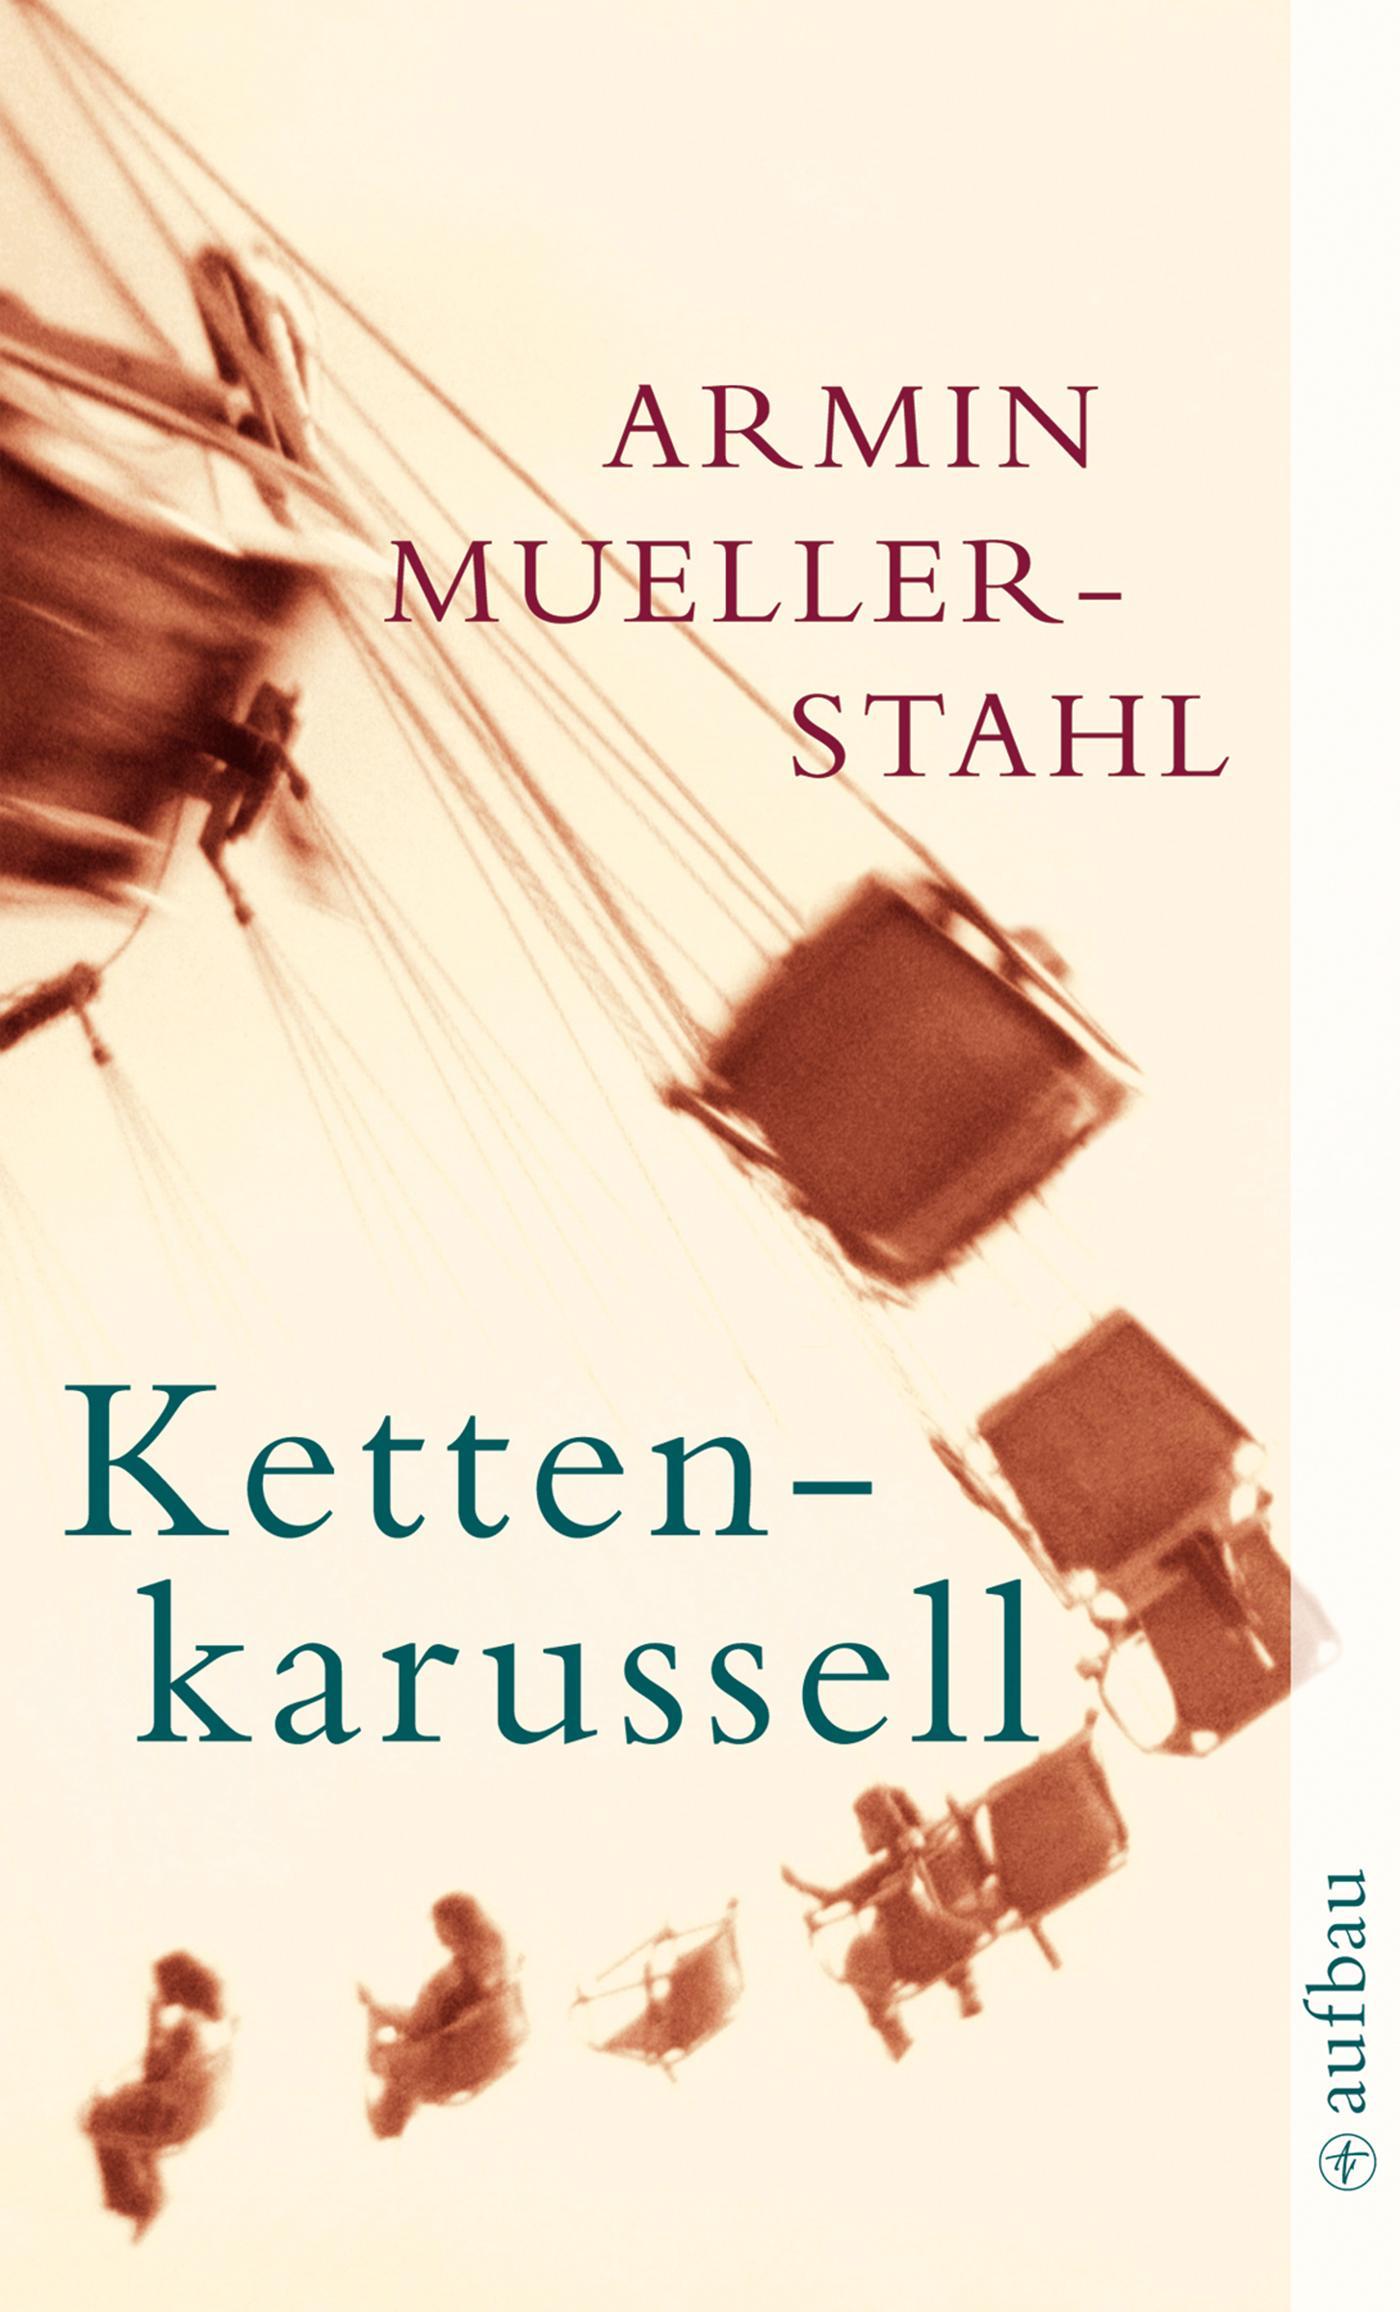 Armin Mueller-Stahl / Kettenkarussell /  9783746624273